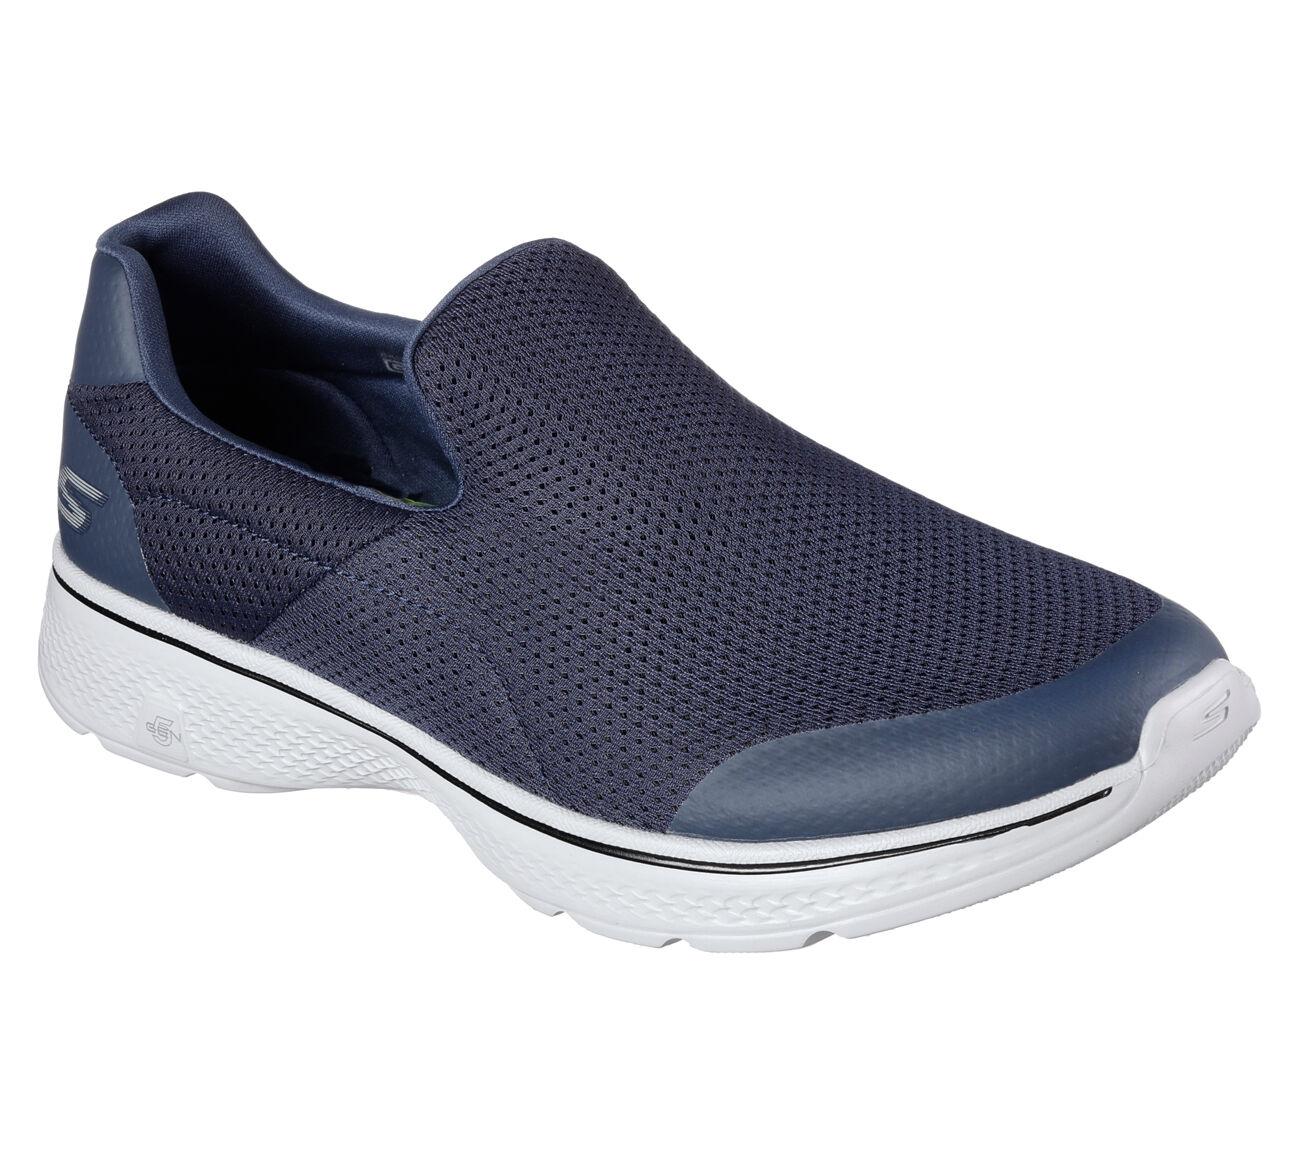 SCARPE SKECHERS GO WALK 4- INCrossoIBLE uomo uomo uomo mocassino slip on blu 54152 NVGY   Shopping Online    Uomo/Donne Scarpa  7b9e95